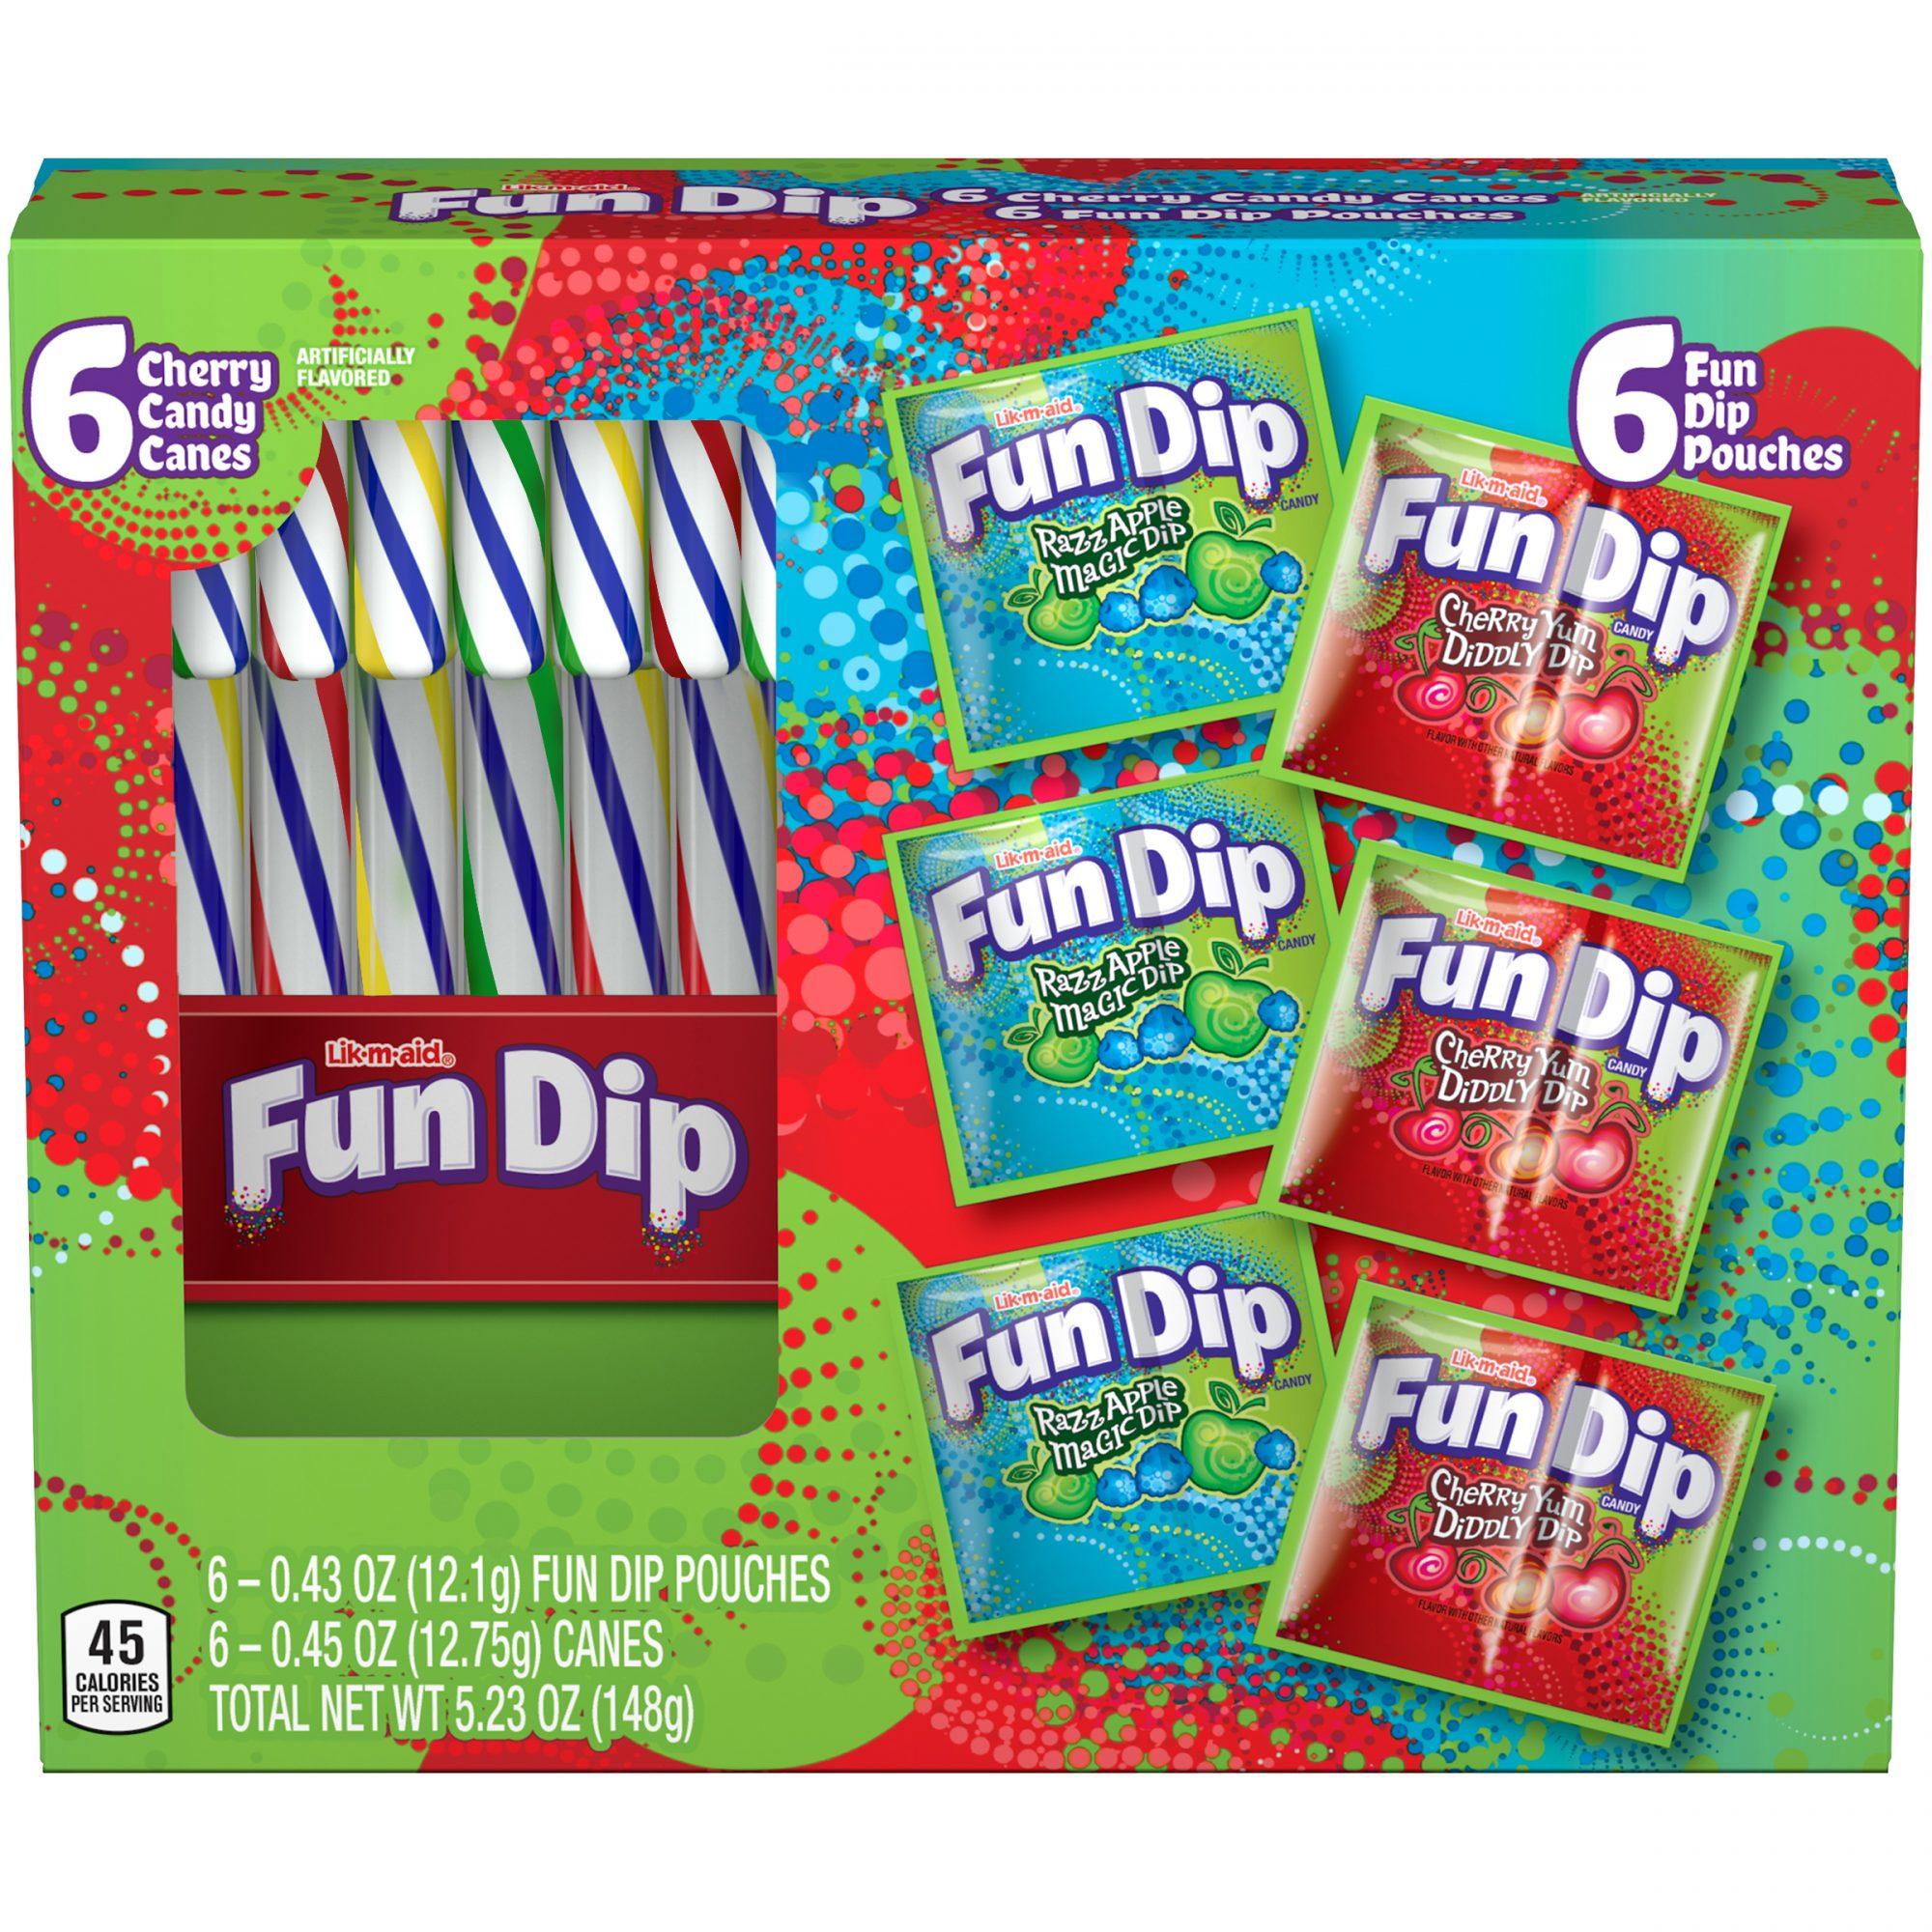 Fun Dip Candy Canes at Walmart.jpg